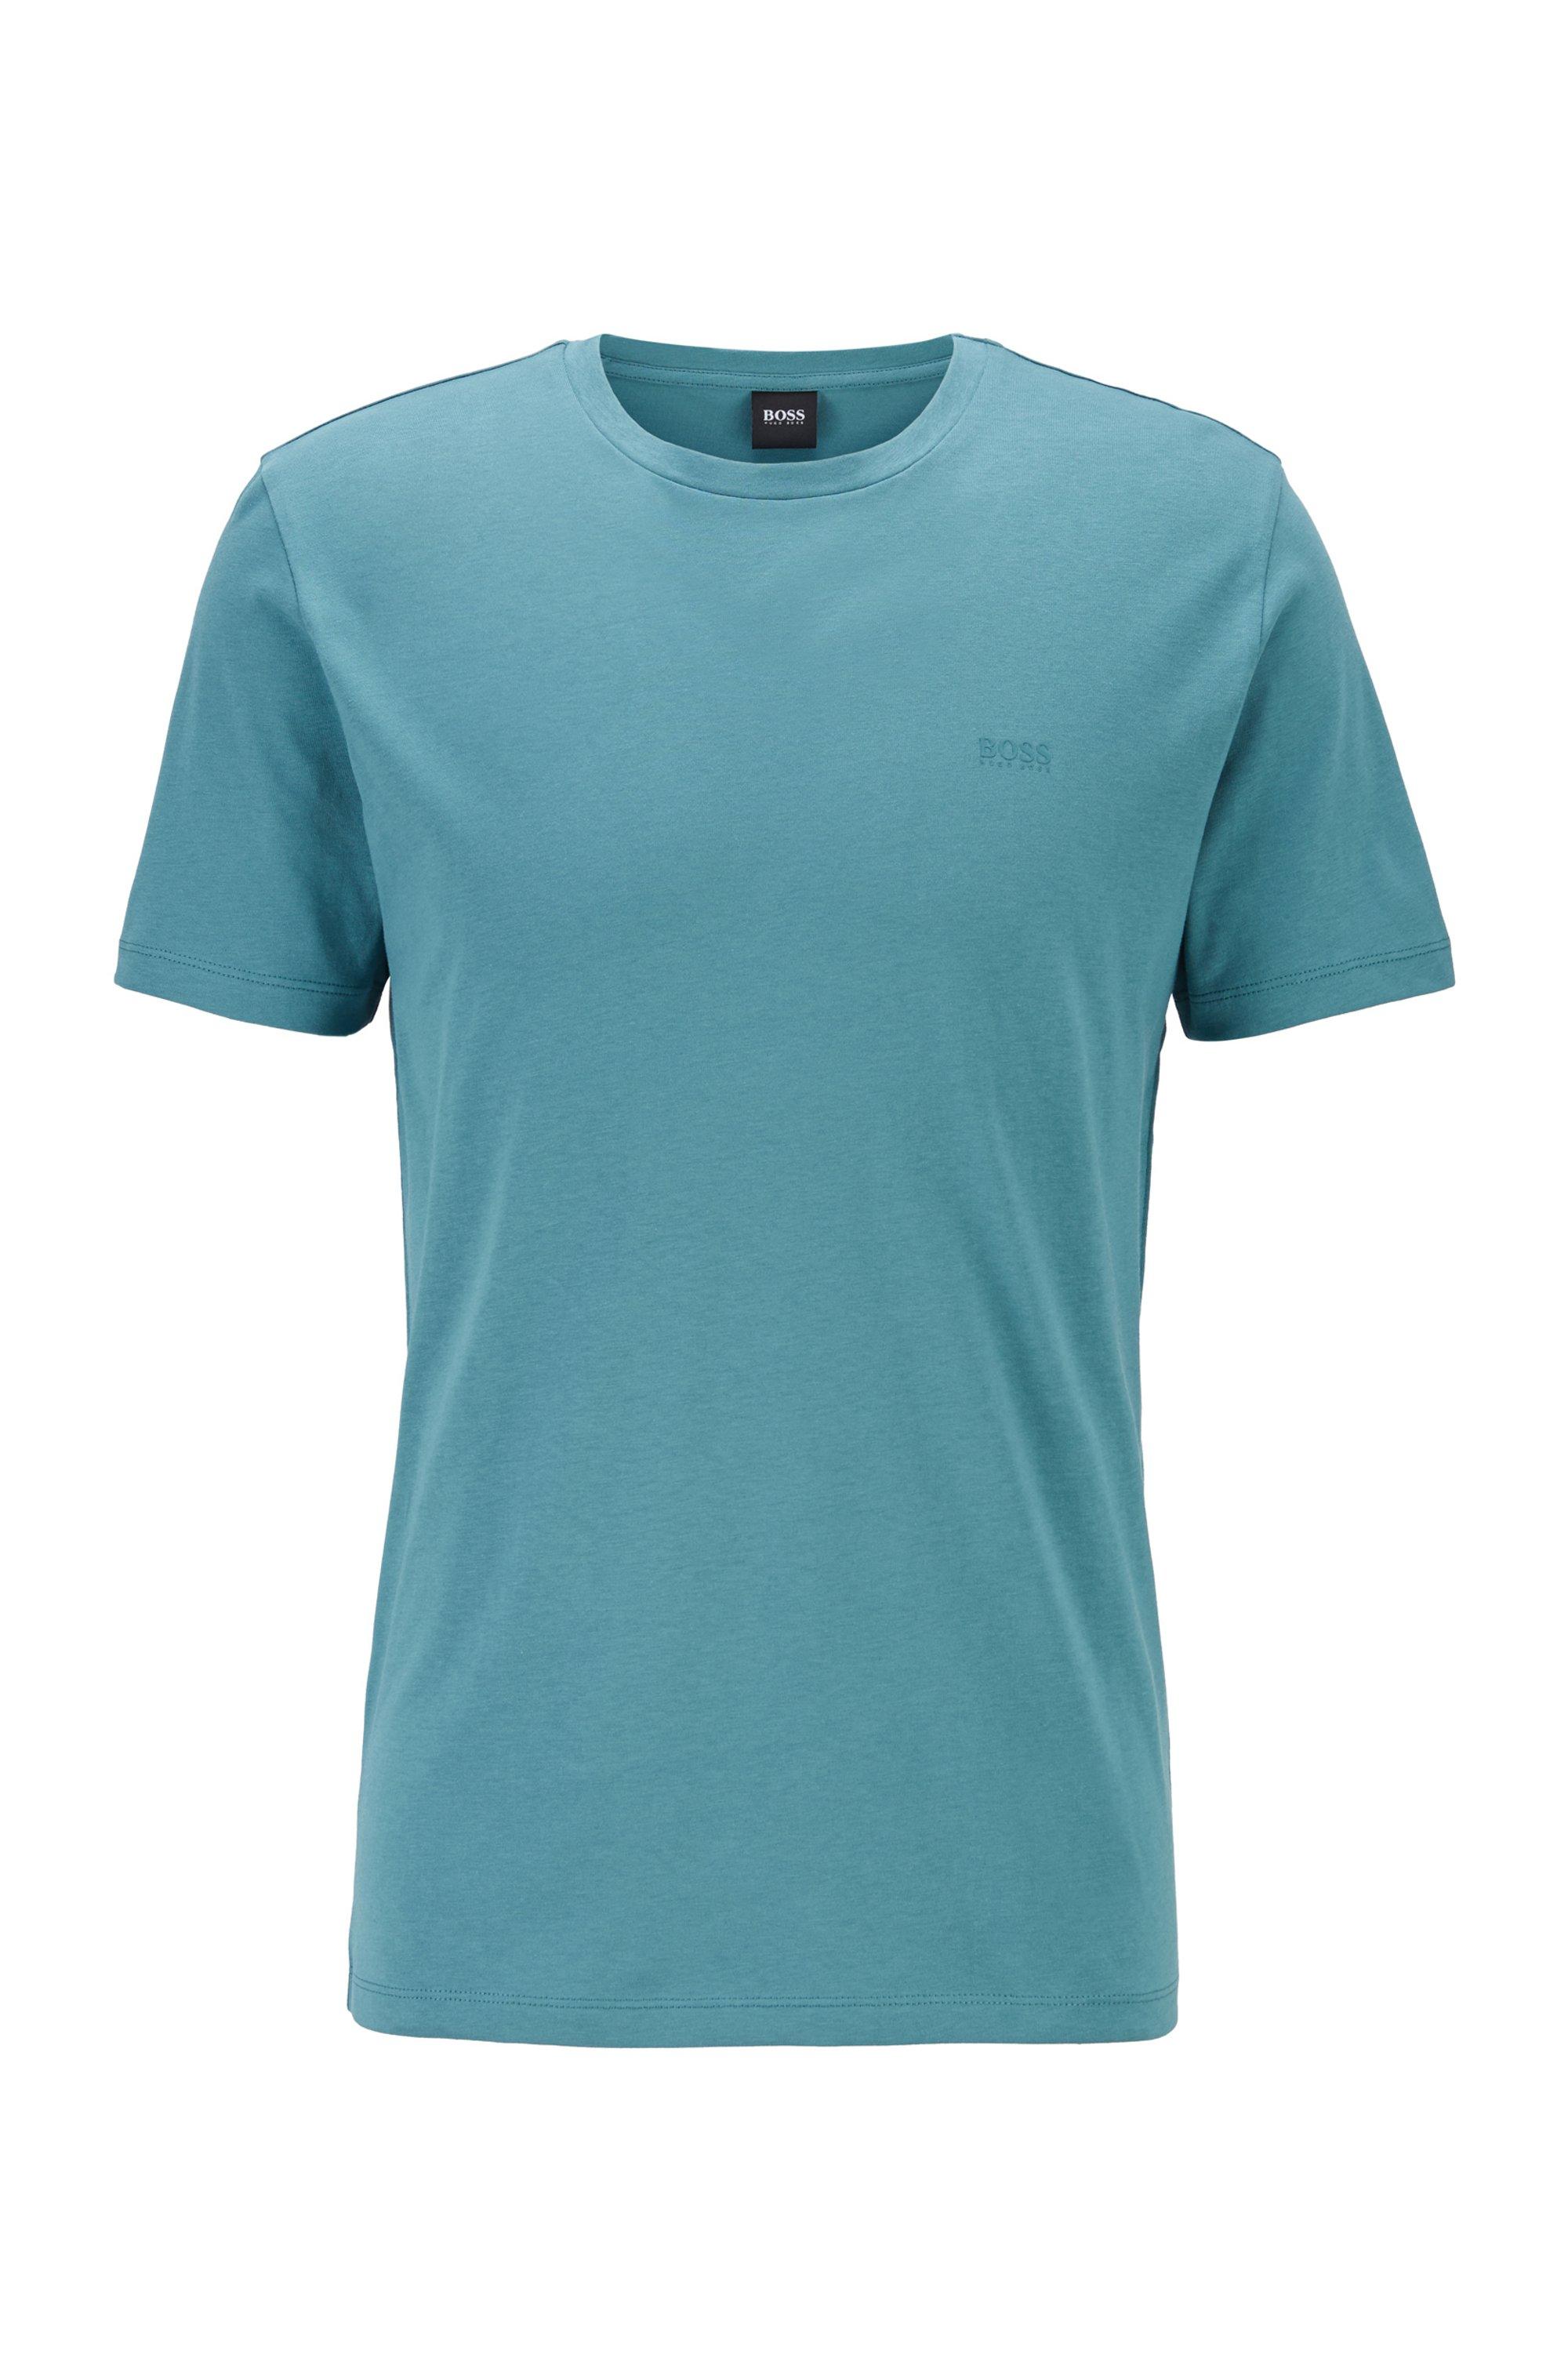 Camiseta de cuello redondo en punto sencillo teñido en hilo, Verde